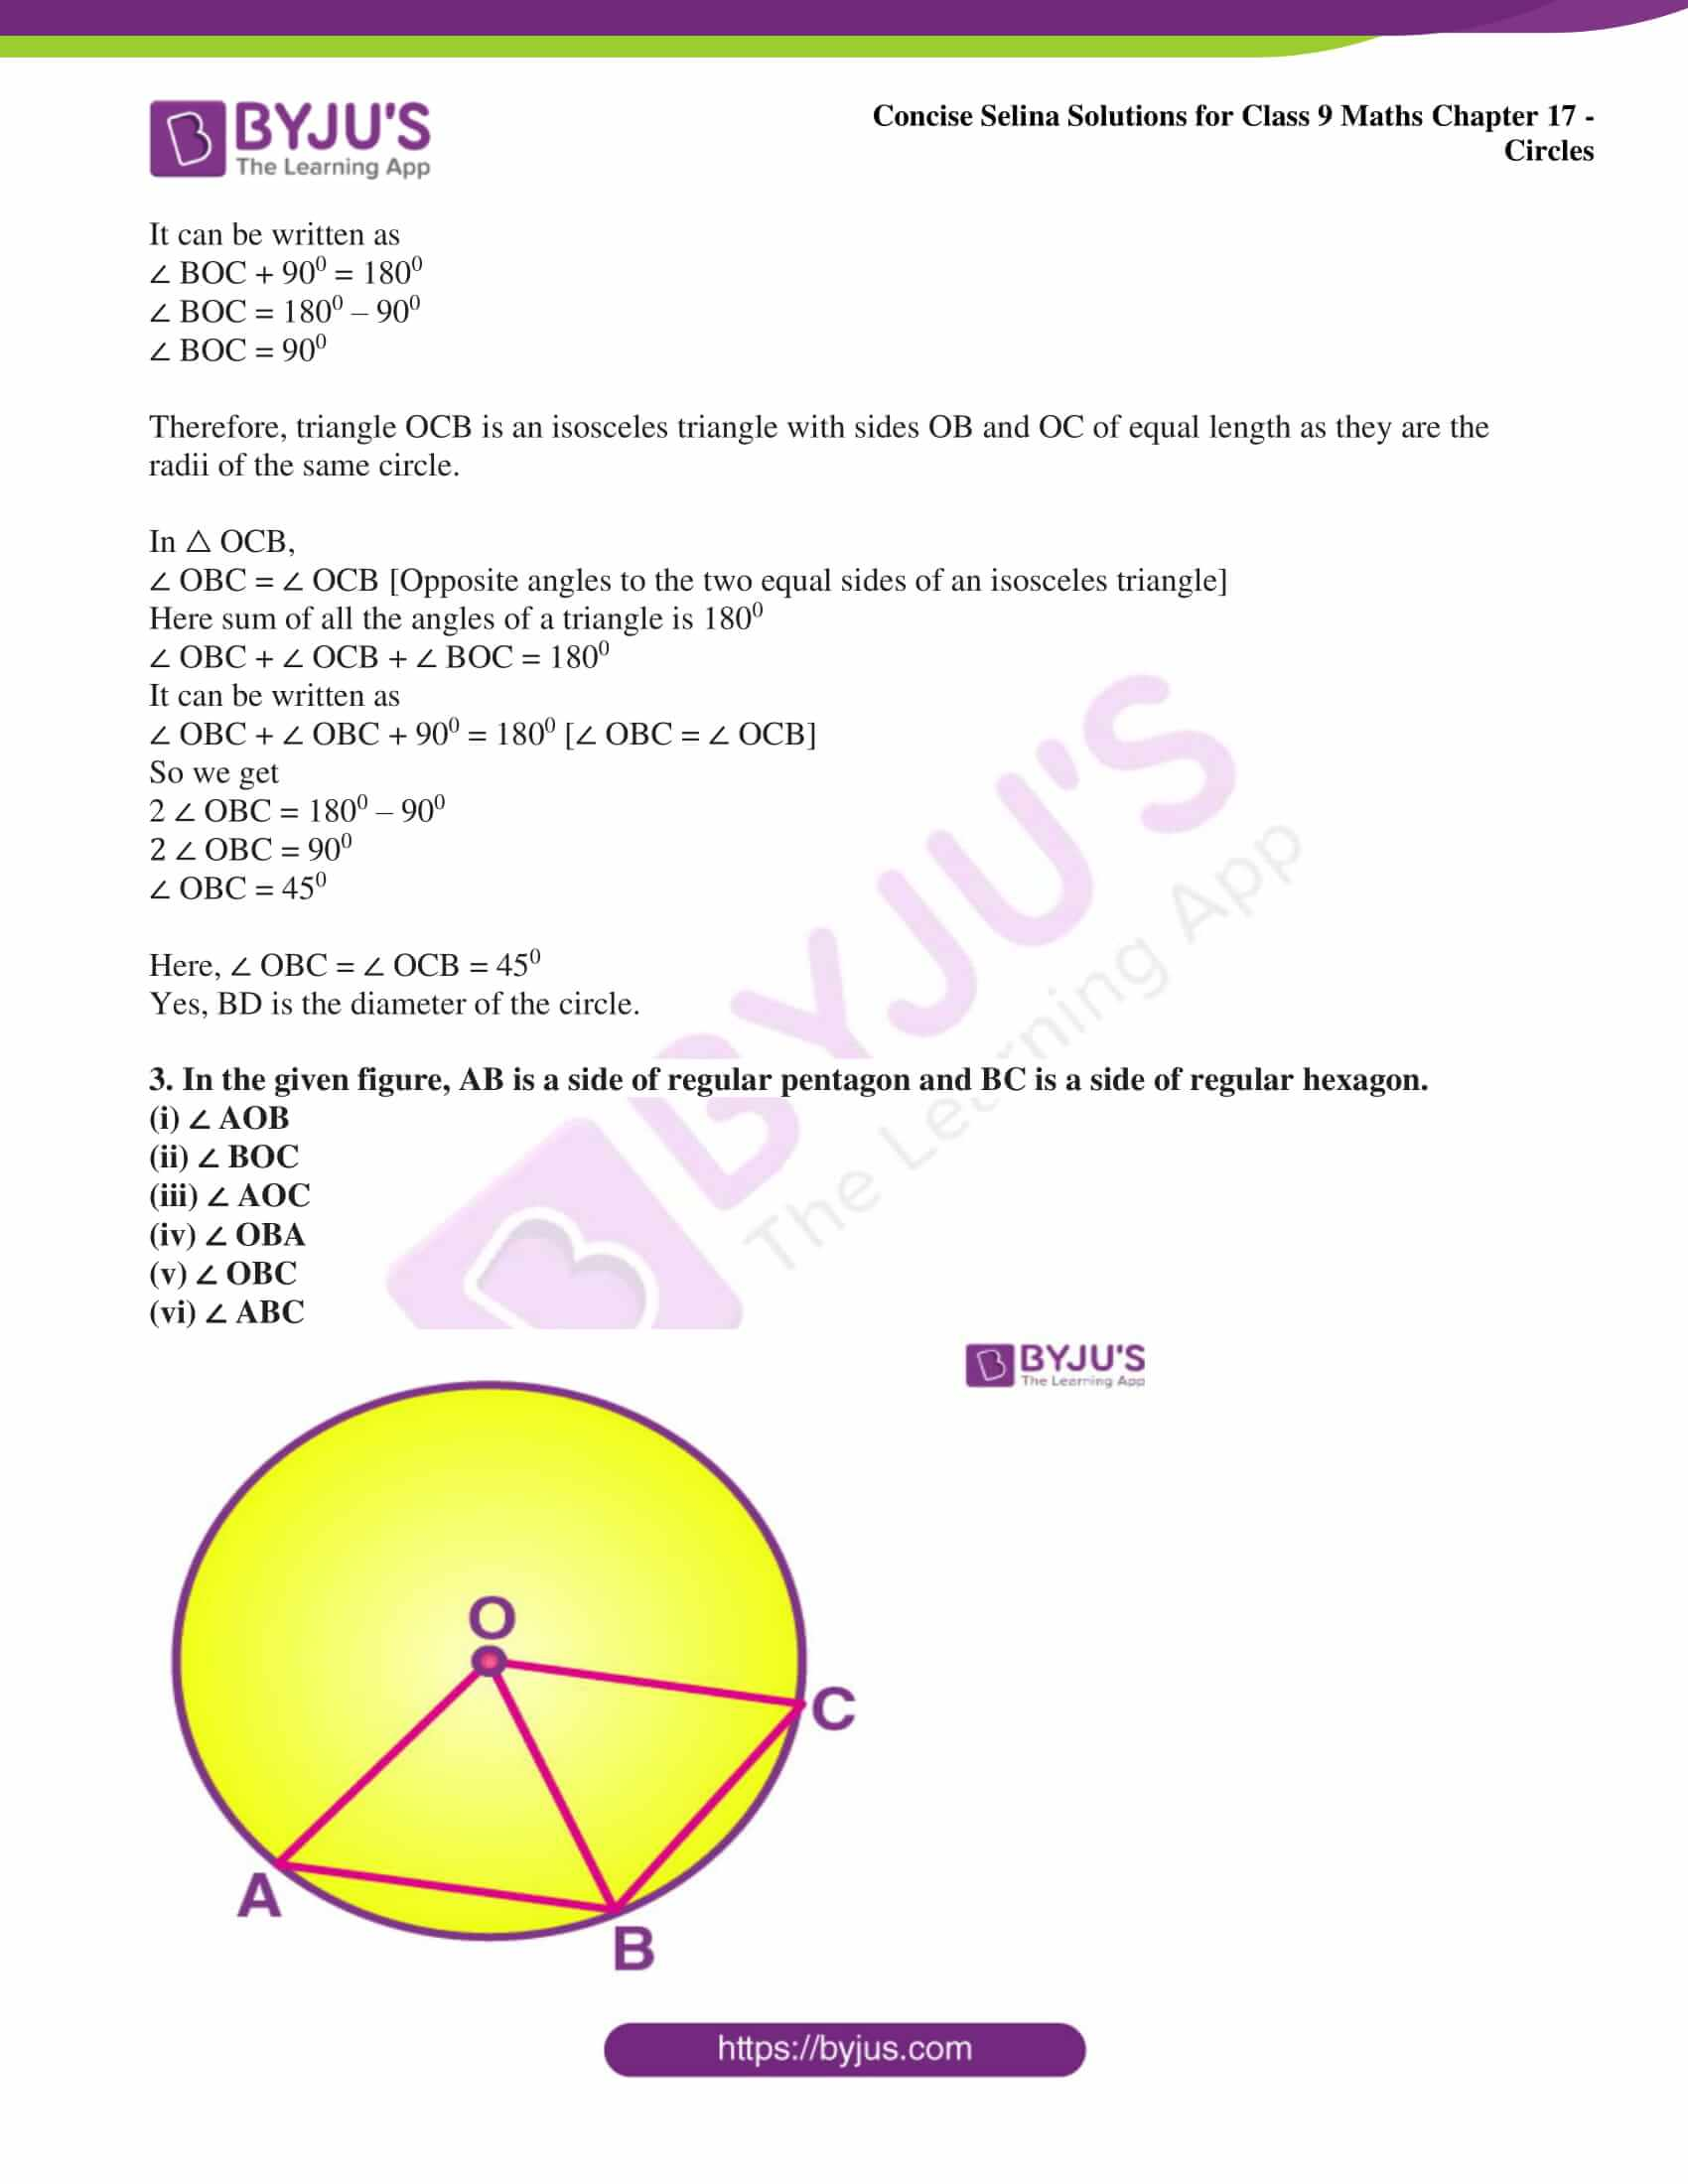 icse class 9 maths may10 selina solutions chapter 17 circles 15